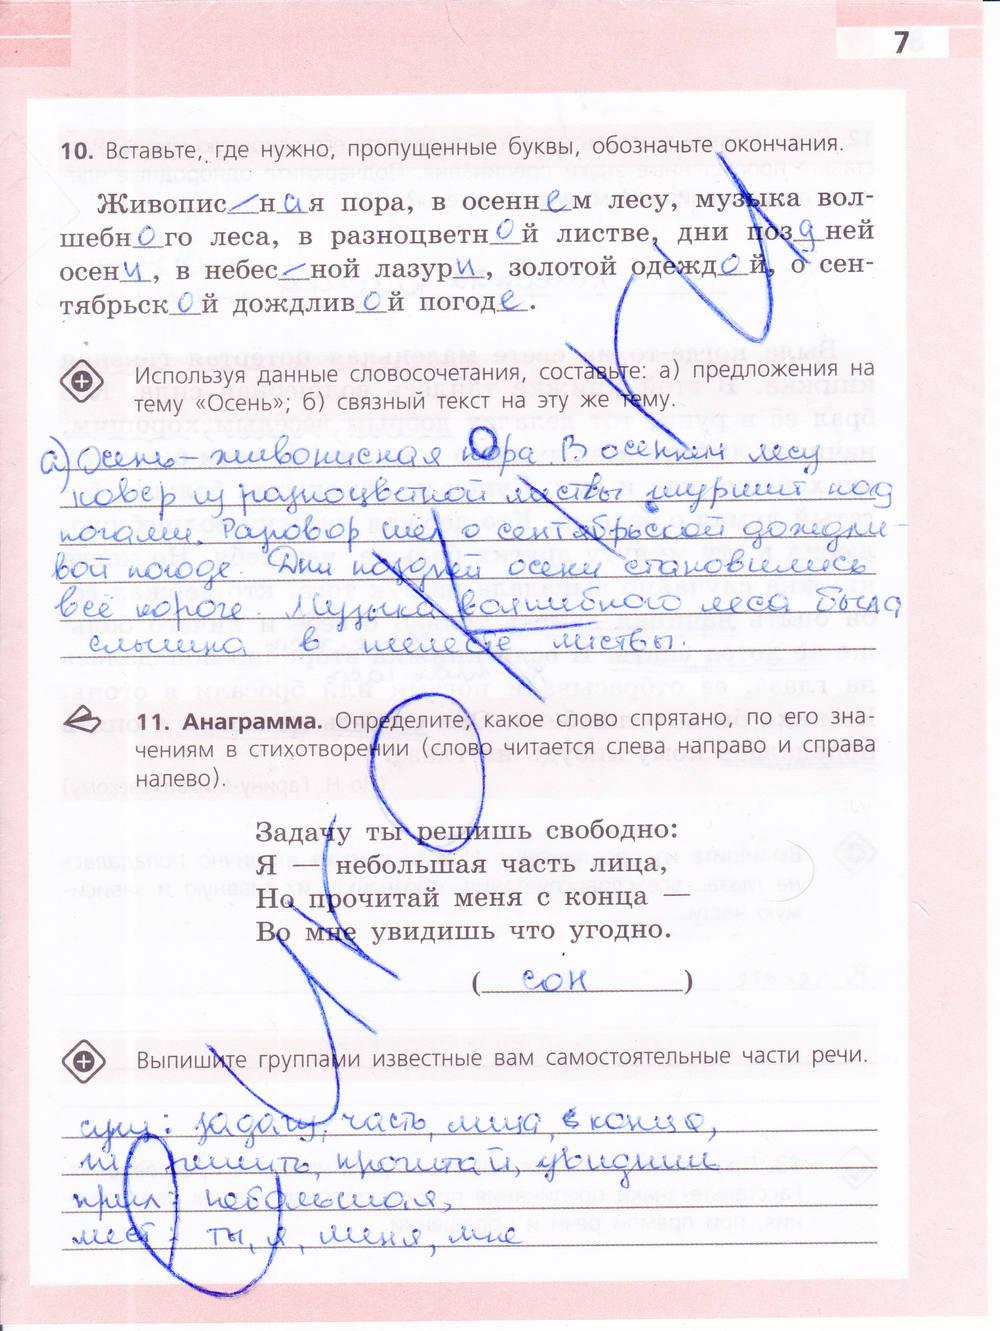 гдз по русскому 6 класс ефремова